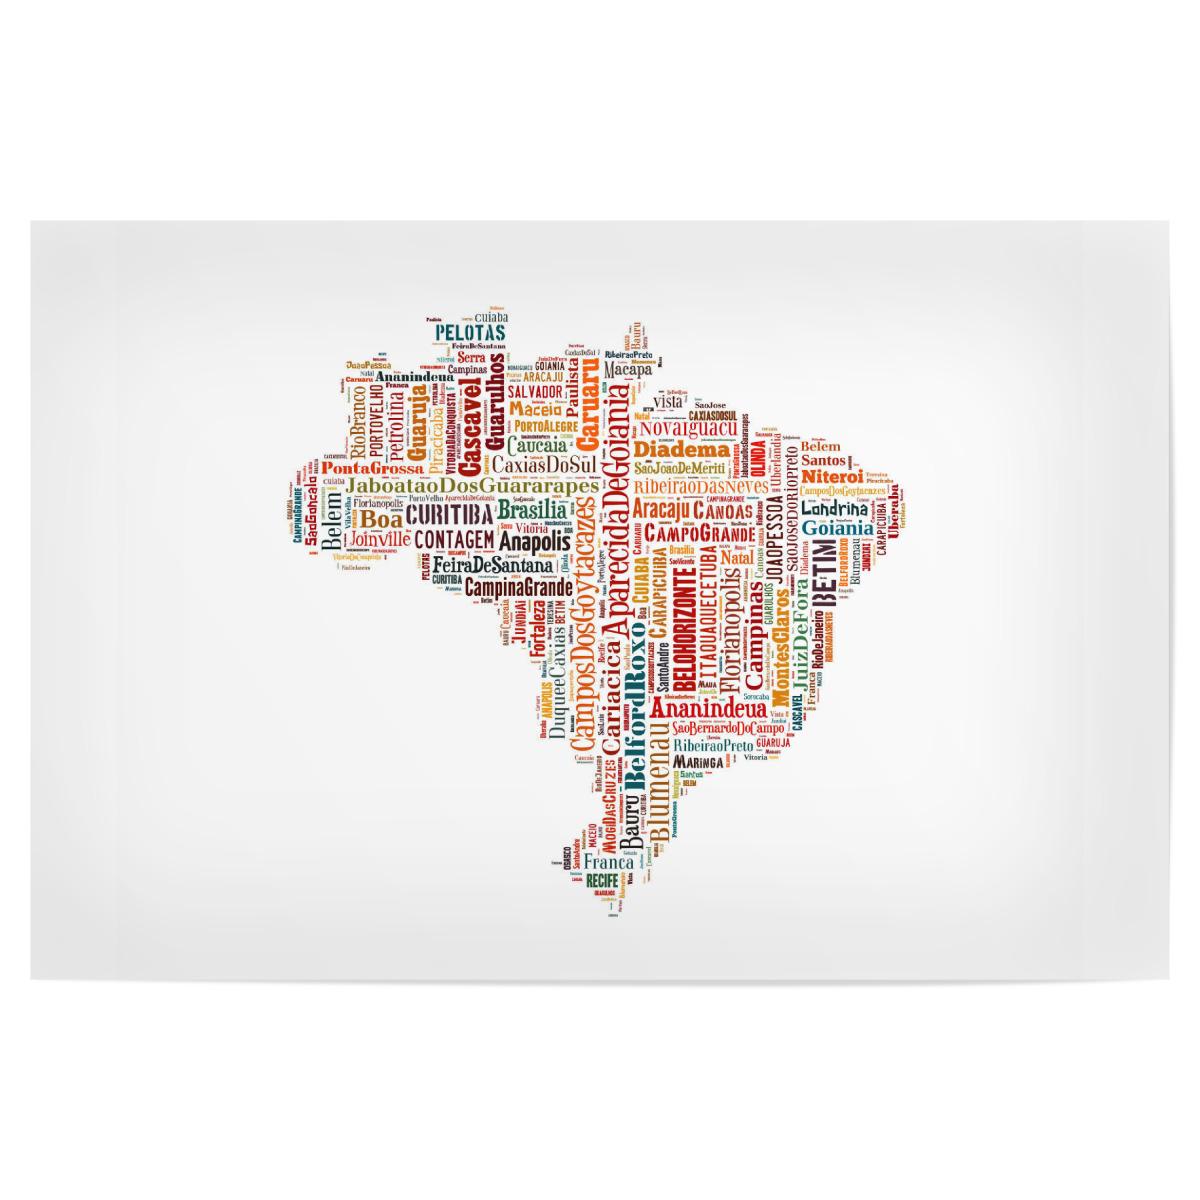 Brazil Map Black als Poster bei artboxONE kaufen